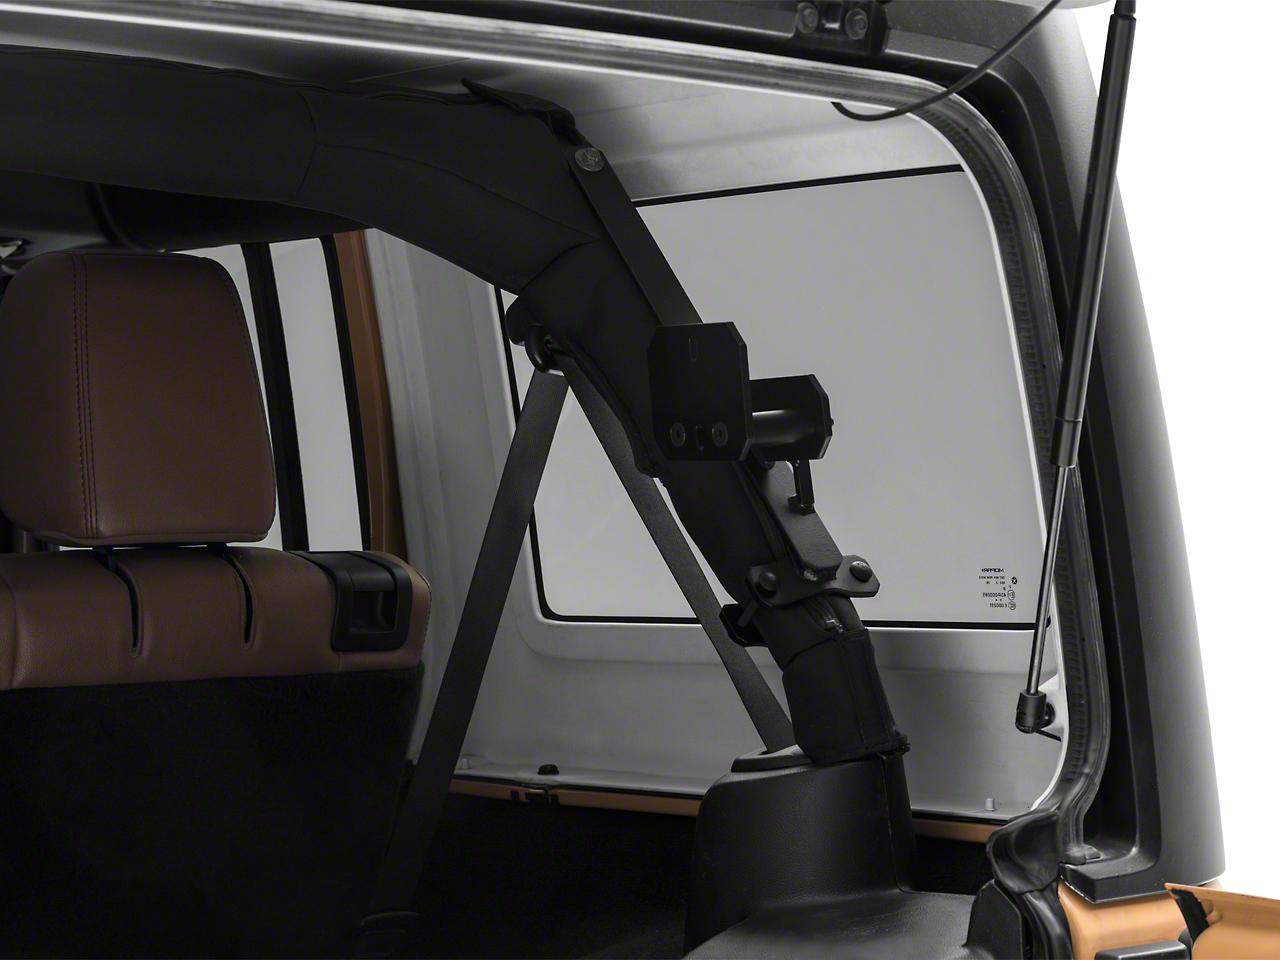 Garvin Interior Roll Bar Rotopox Can Mount for Hard Tops (07-18 Jeep Wrangler JK 4 Door)